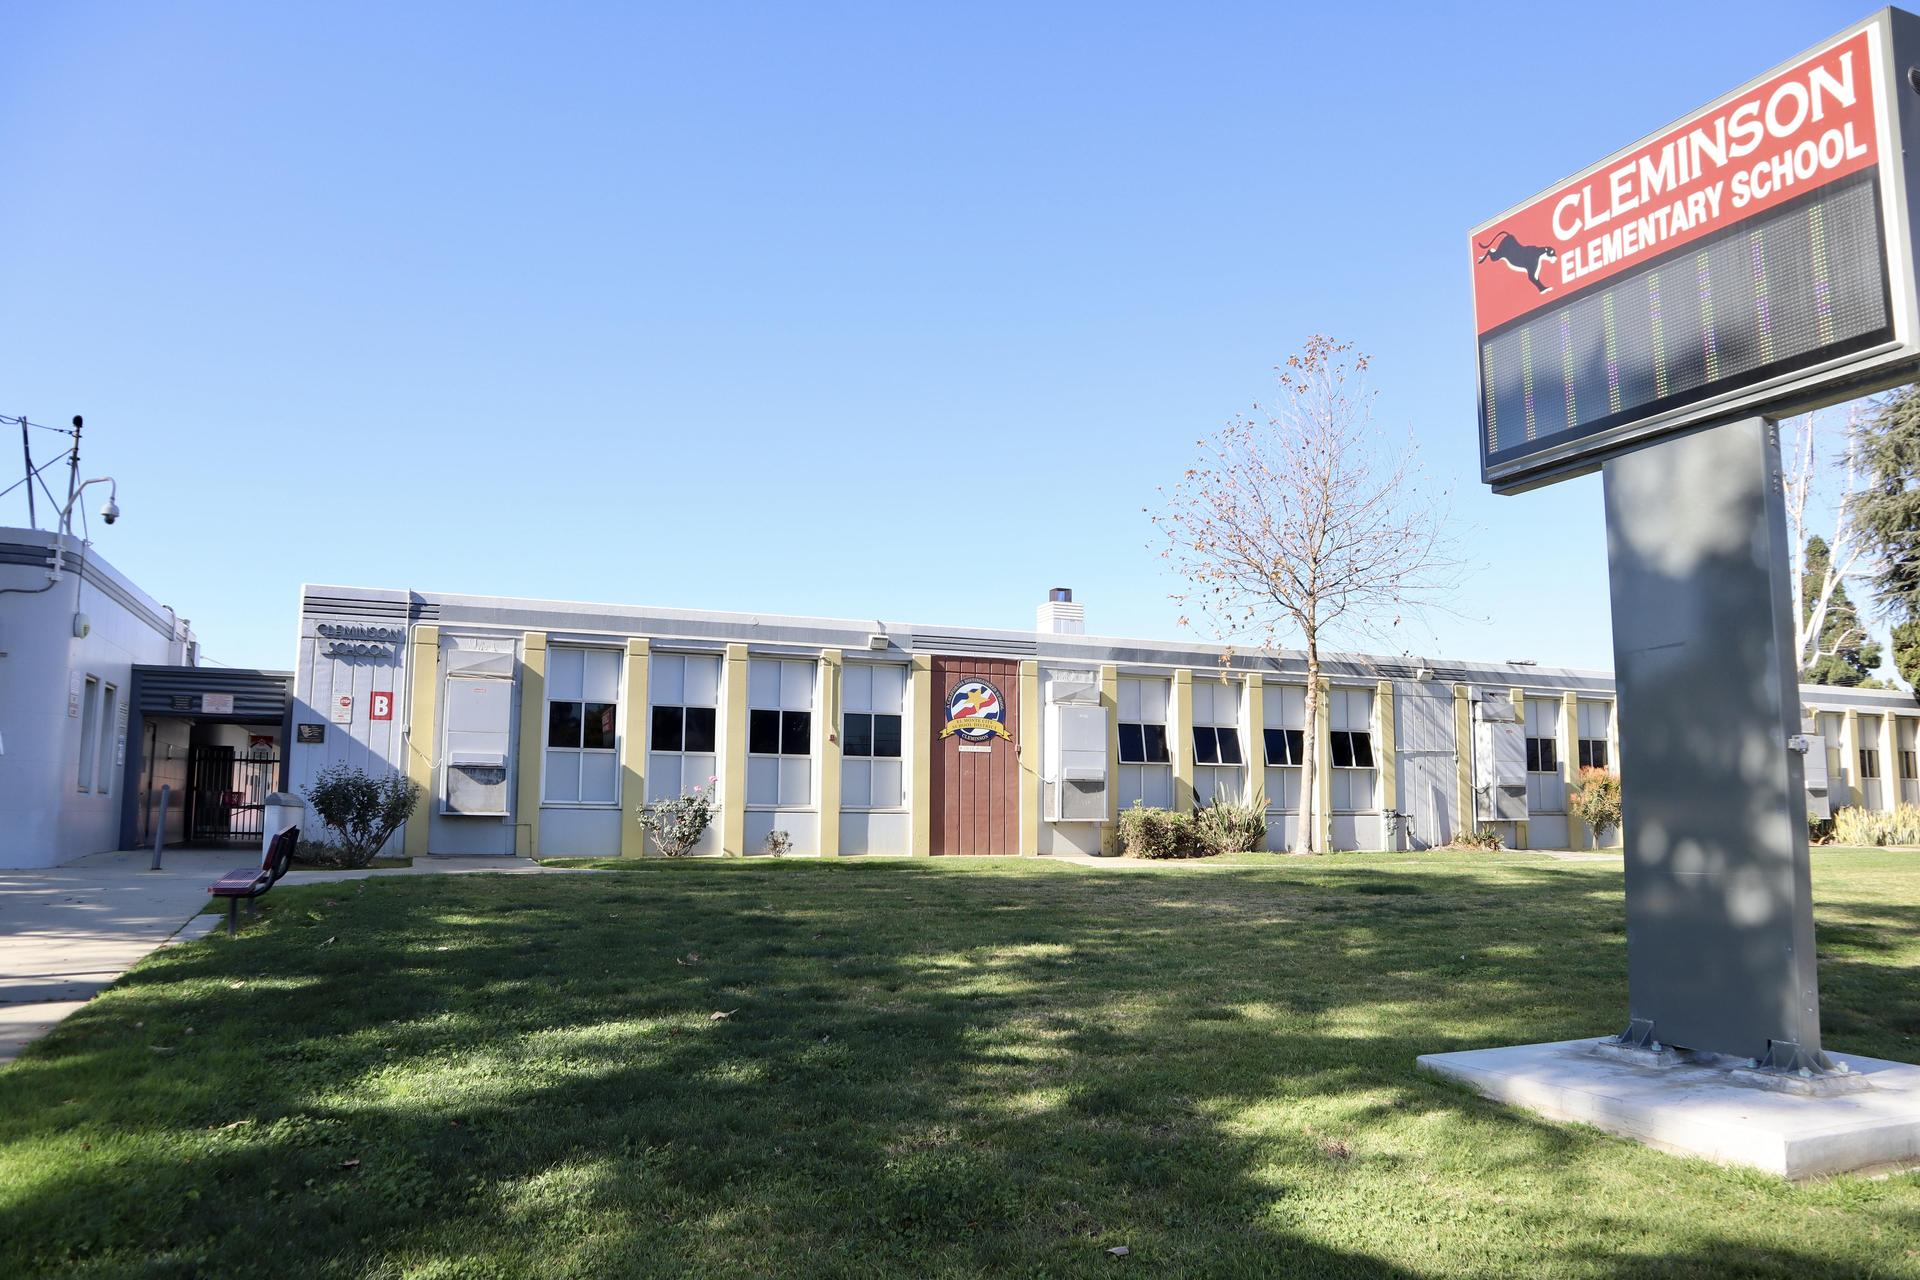 Photo of Cleminson Campus